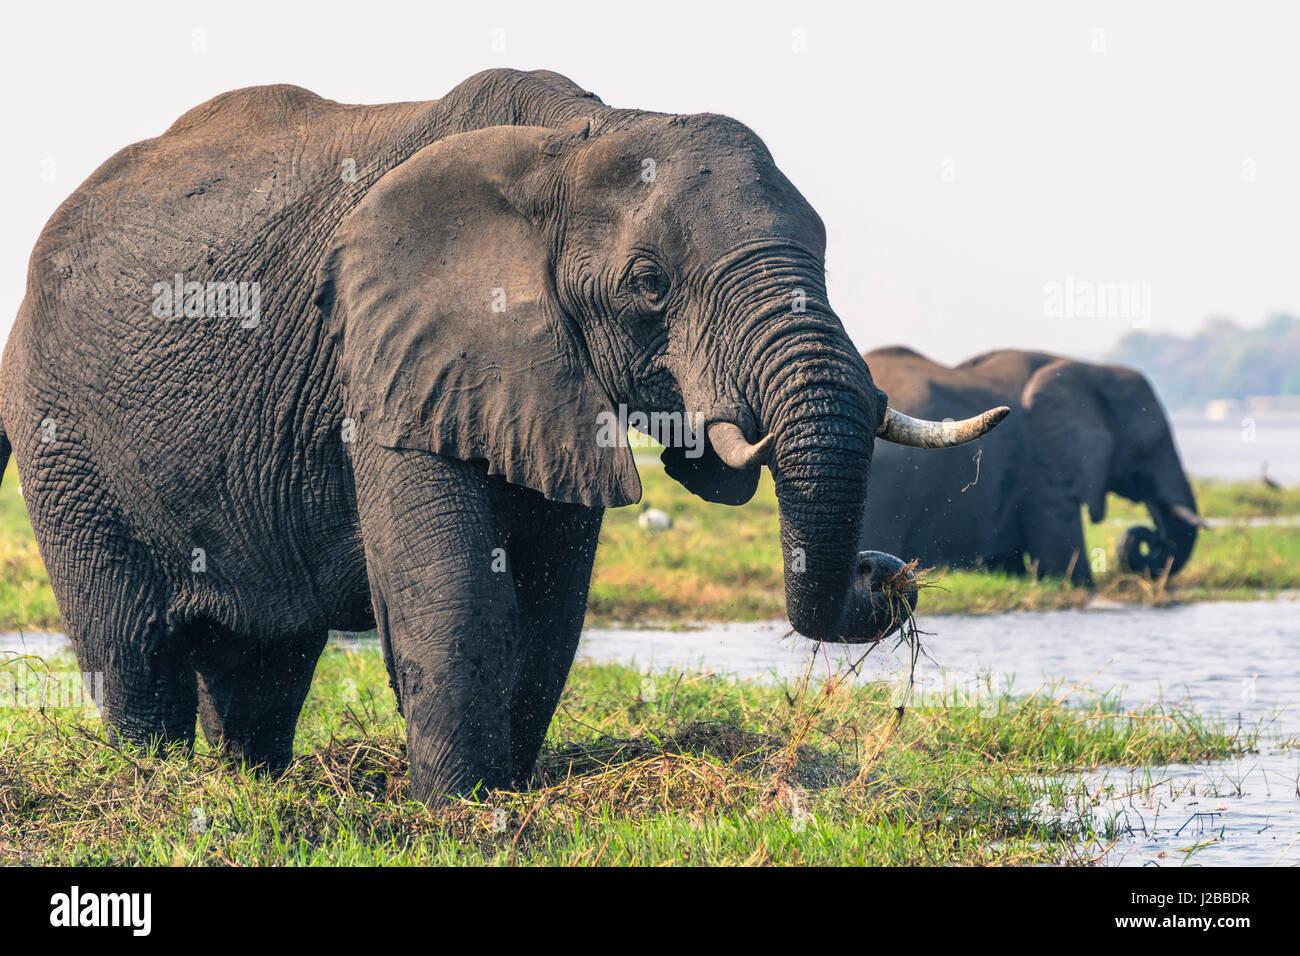 Botswana. Chobe National Park. Elephant (Loxodonta africana) grazing on an island in the Chobe River. - Stock Image